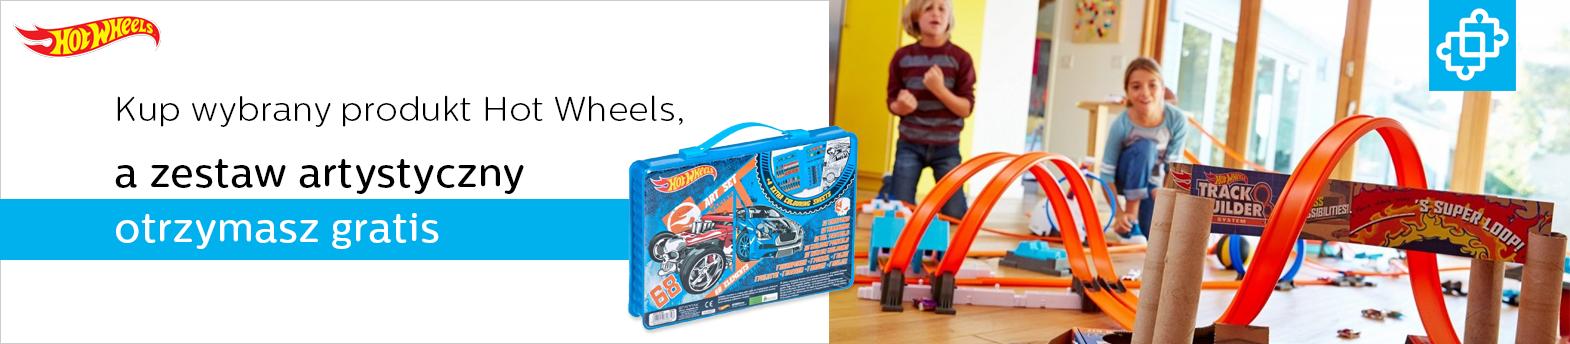 Hot Wheels + gratis